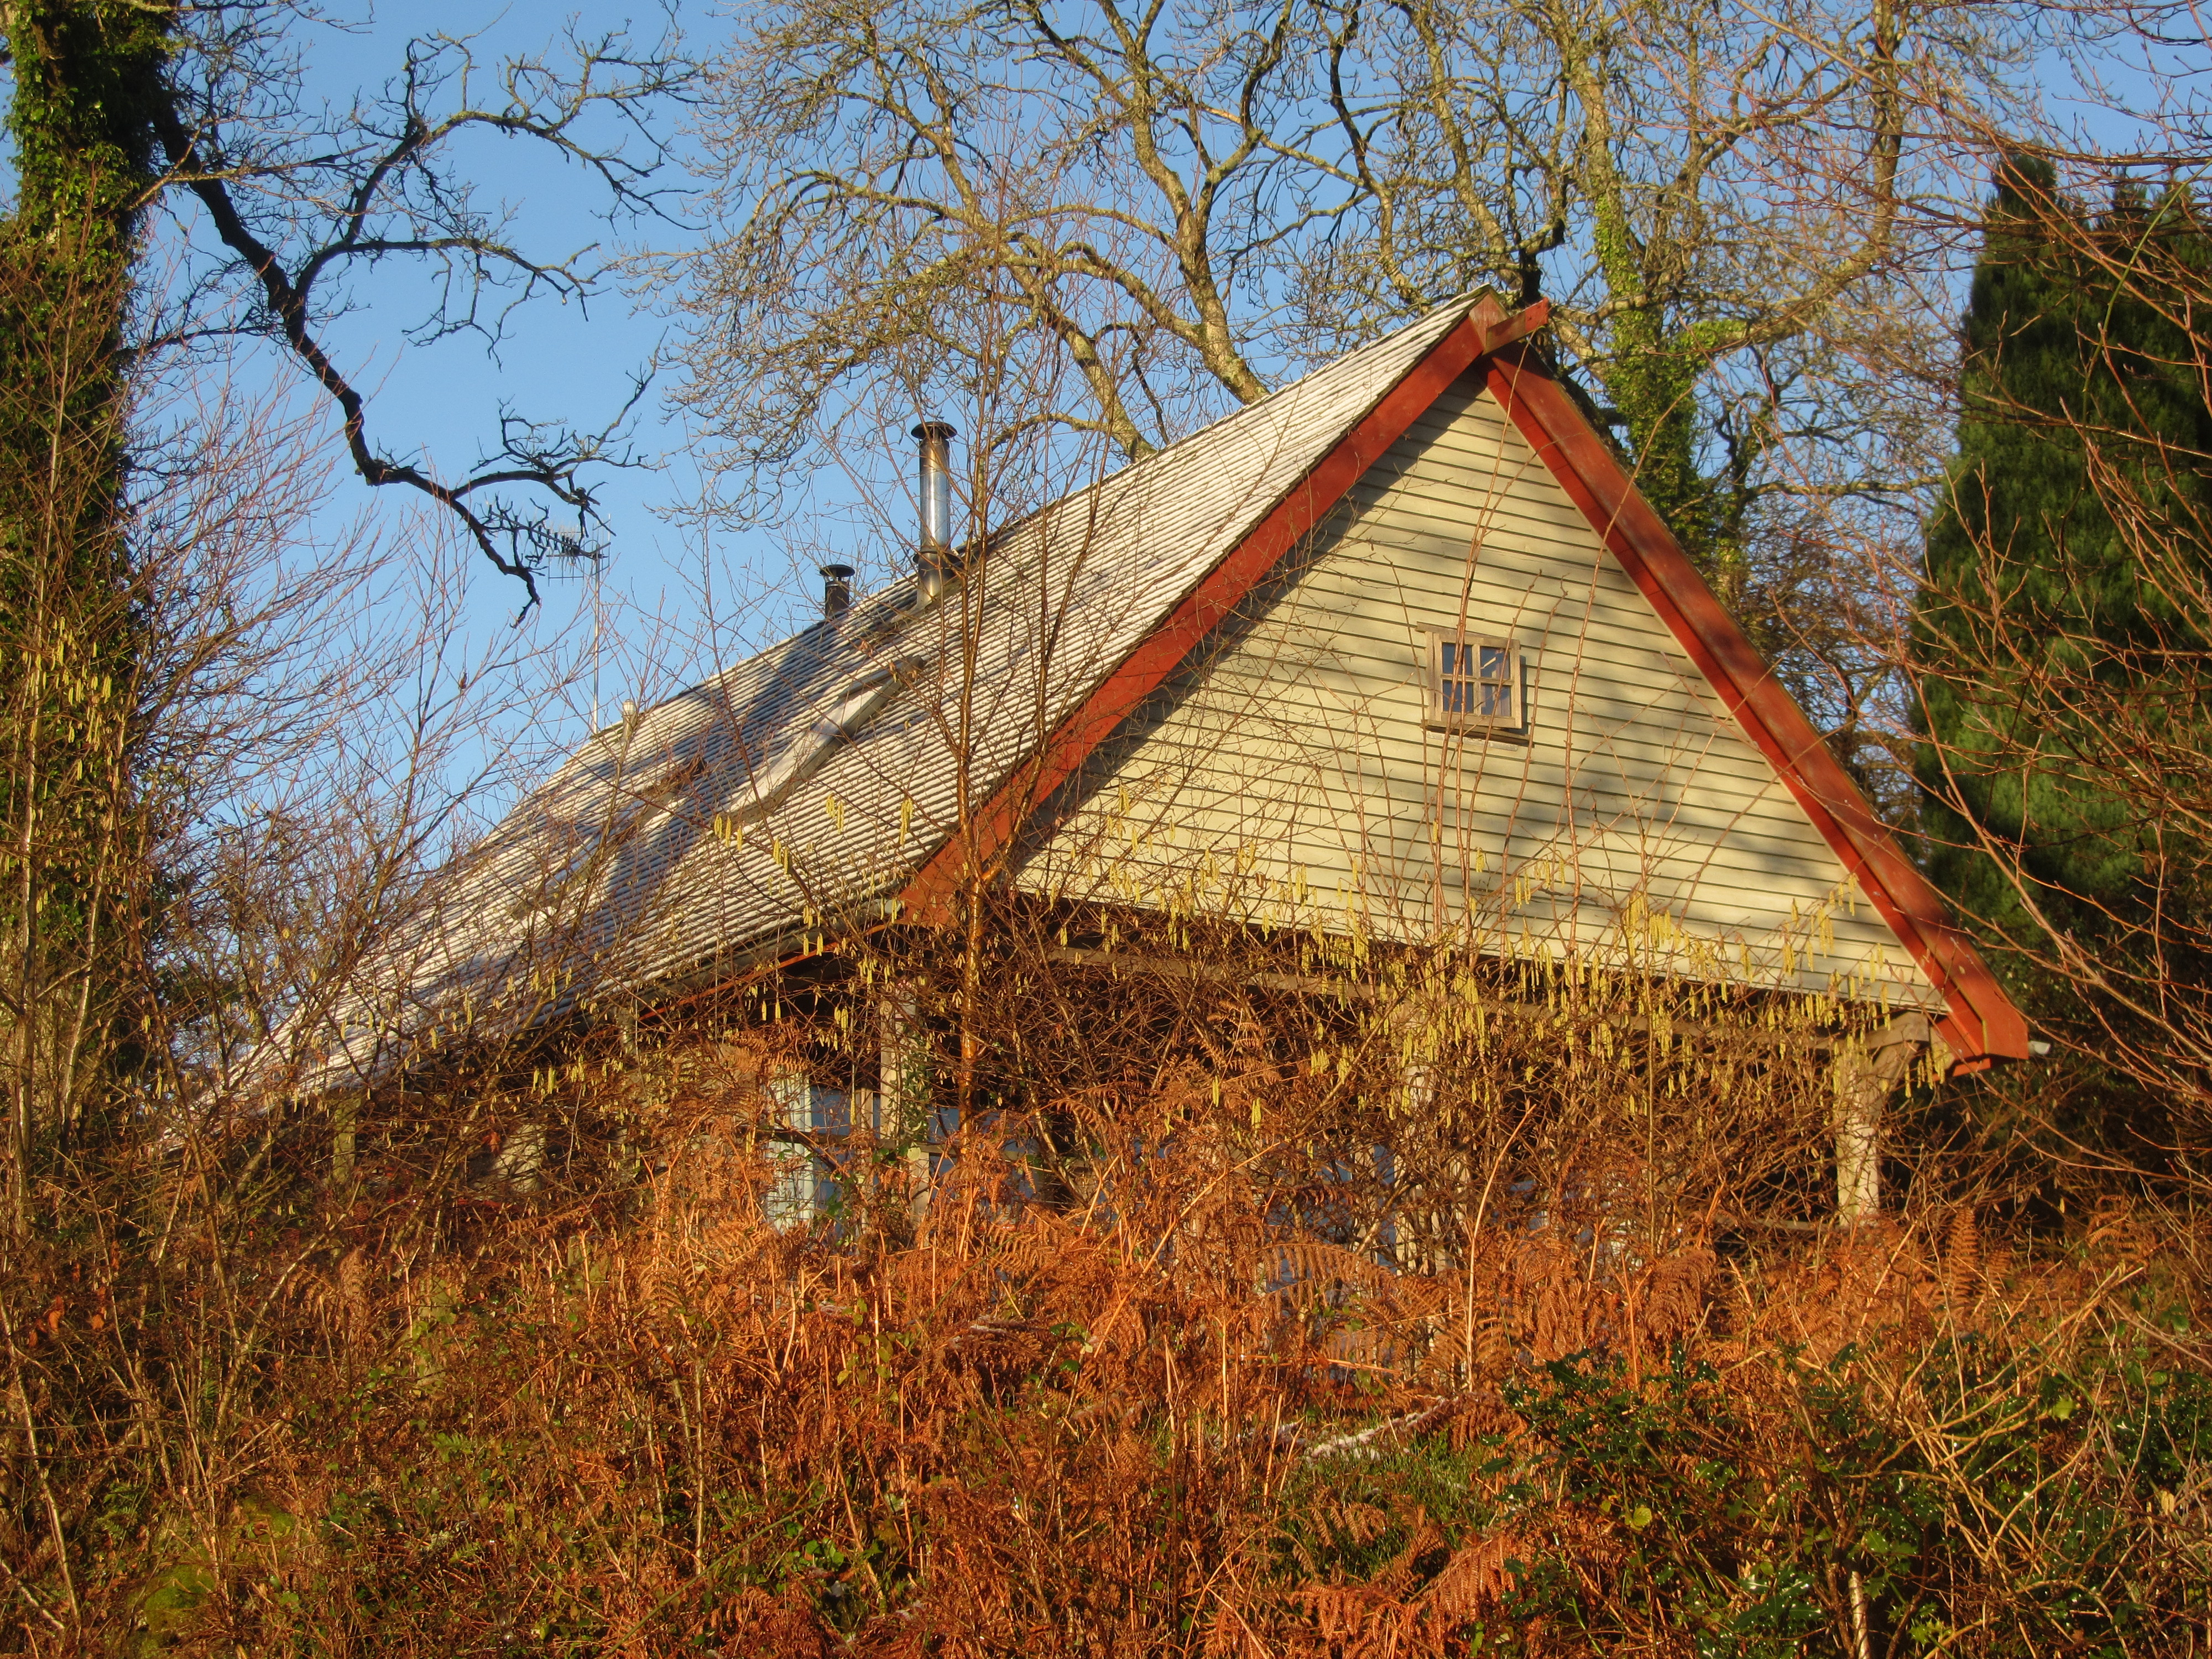 The Hut 1